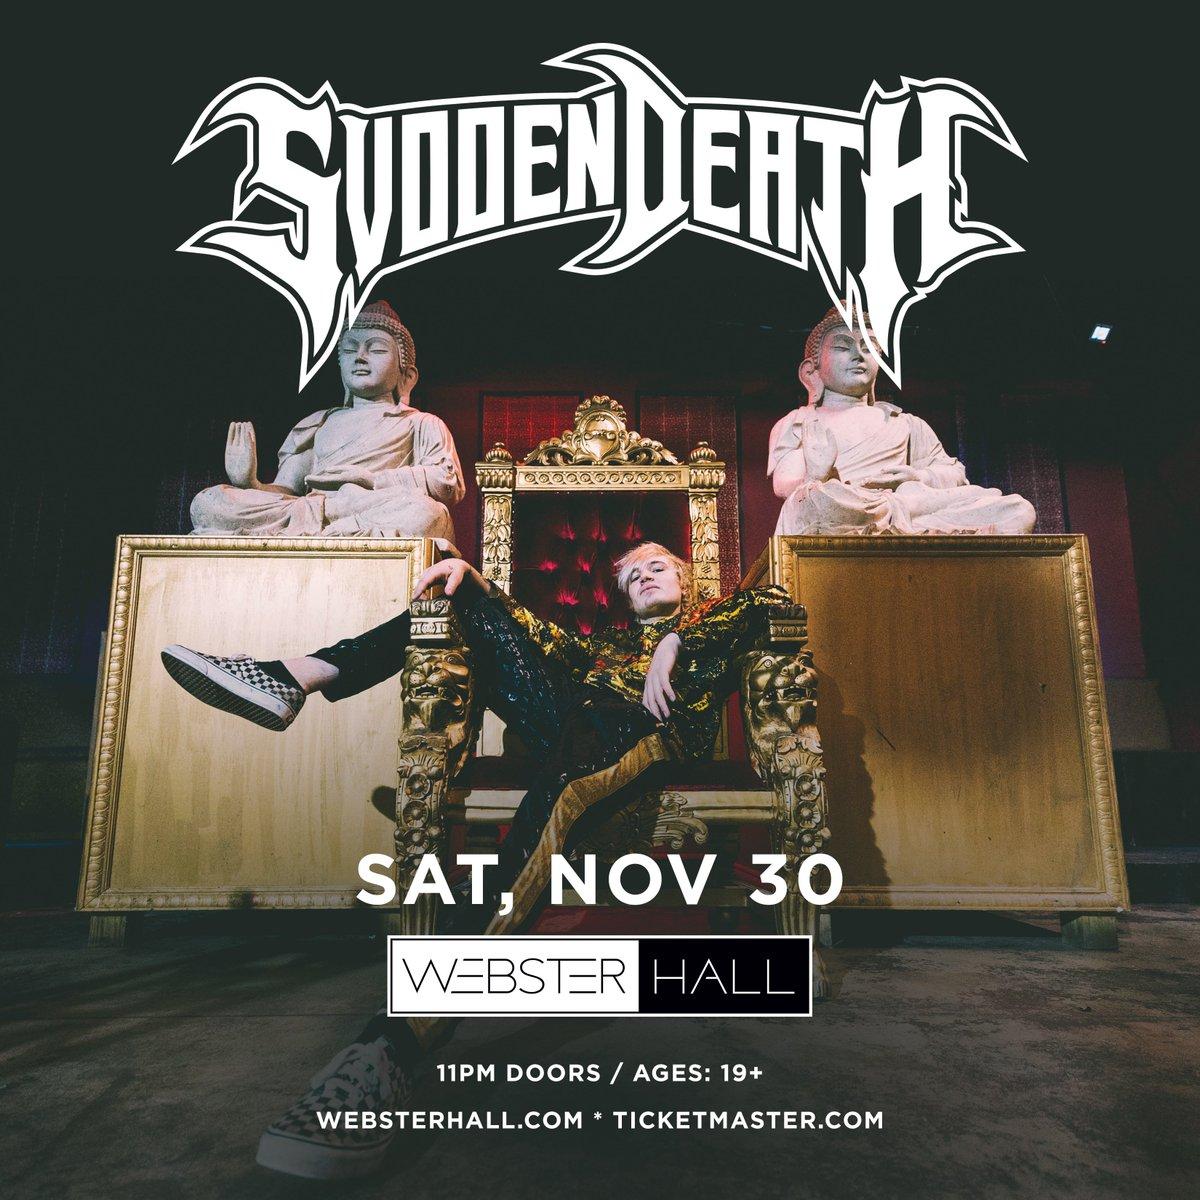 JUST ANNOUNCED: @svddendeathdub will take ya head off on Sat, Nov 30  grab tickets Friday at 10am #latenight >>  https:// tbp.im/2KVUQmi    <br>http://pic.twitter.com/g7PcmAaj8e